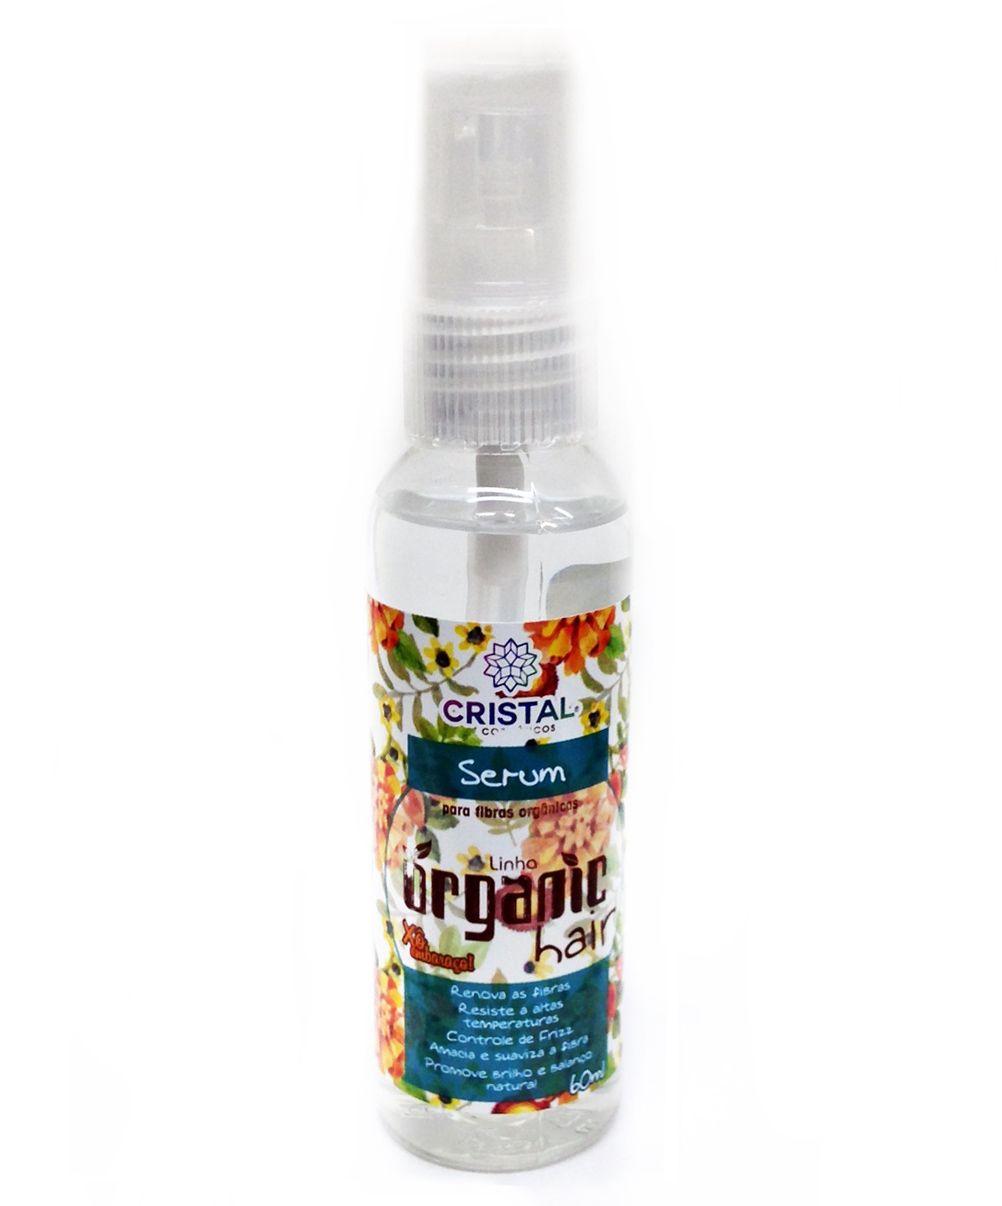 Kit Shampoo Organic Hair 500ml + Creme De Pentear 500ml + Serum 60ml